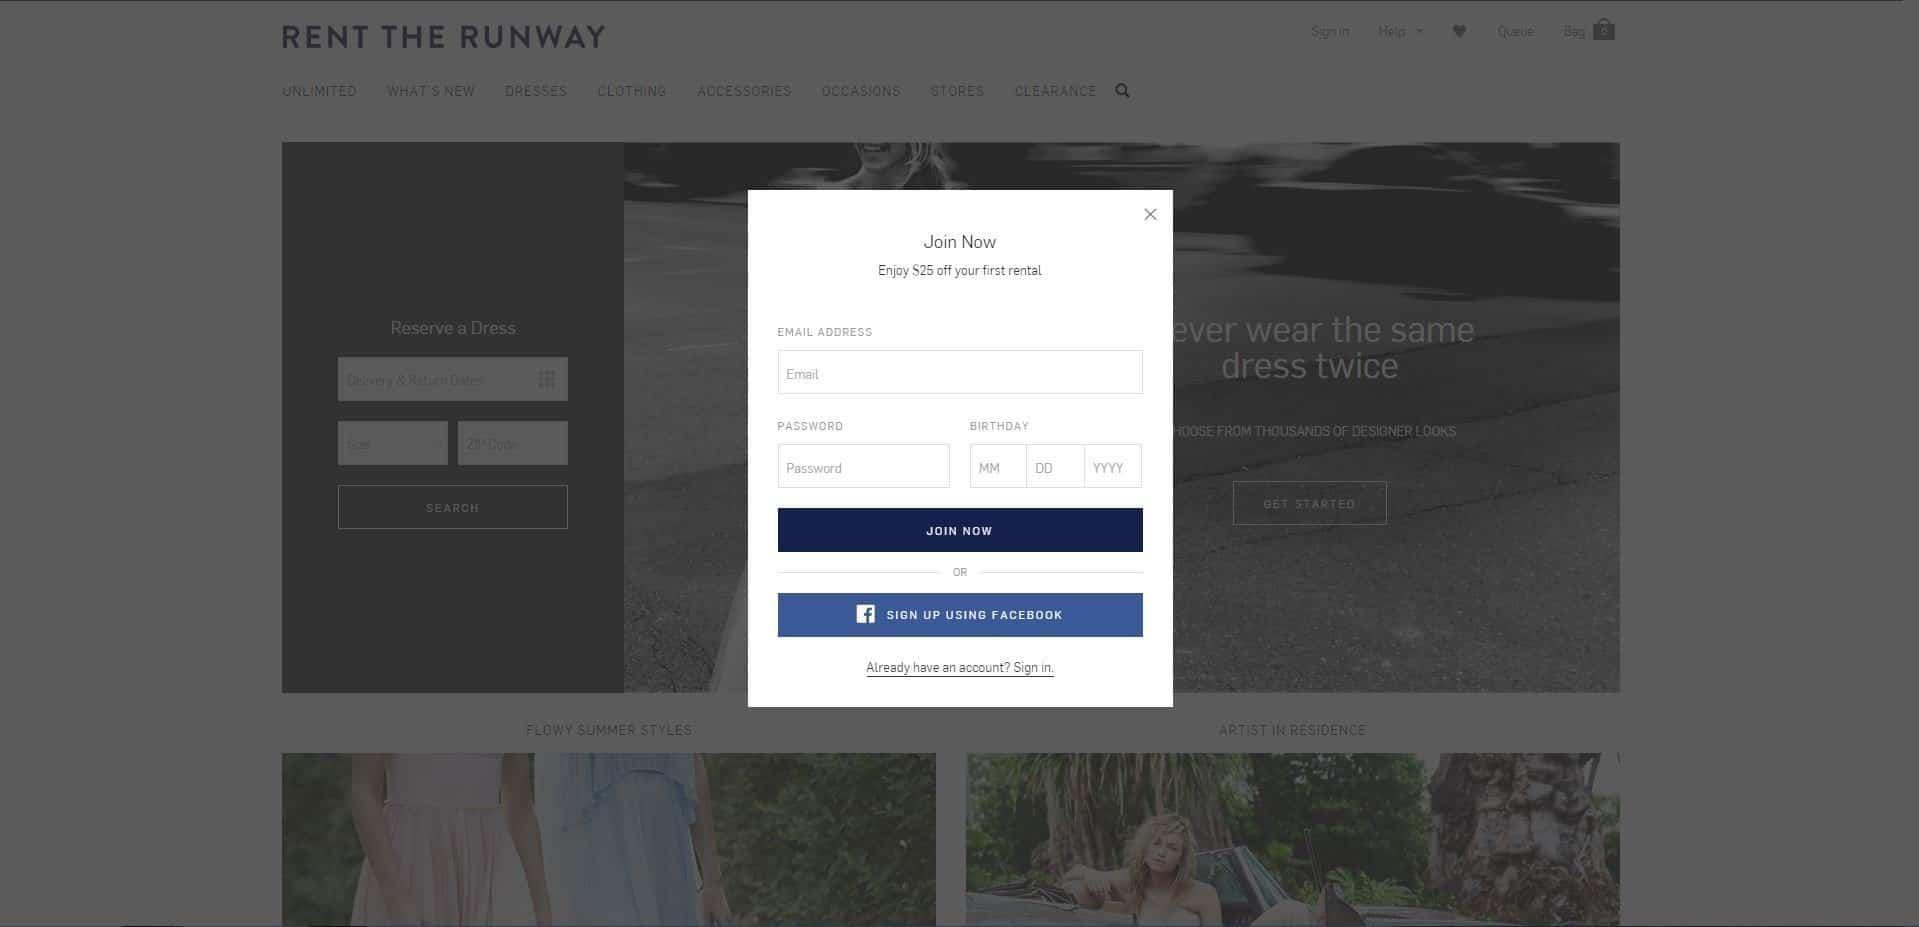 Rent The Runway - reciprocity - browser media